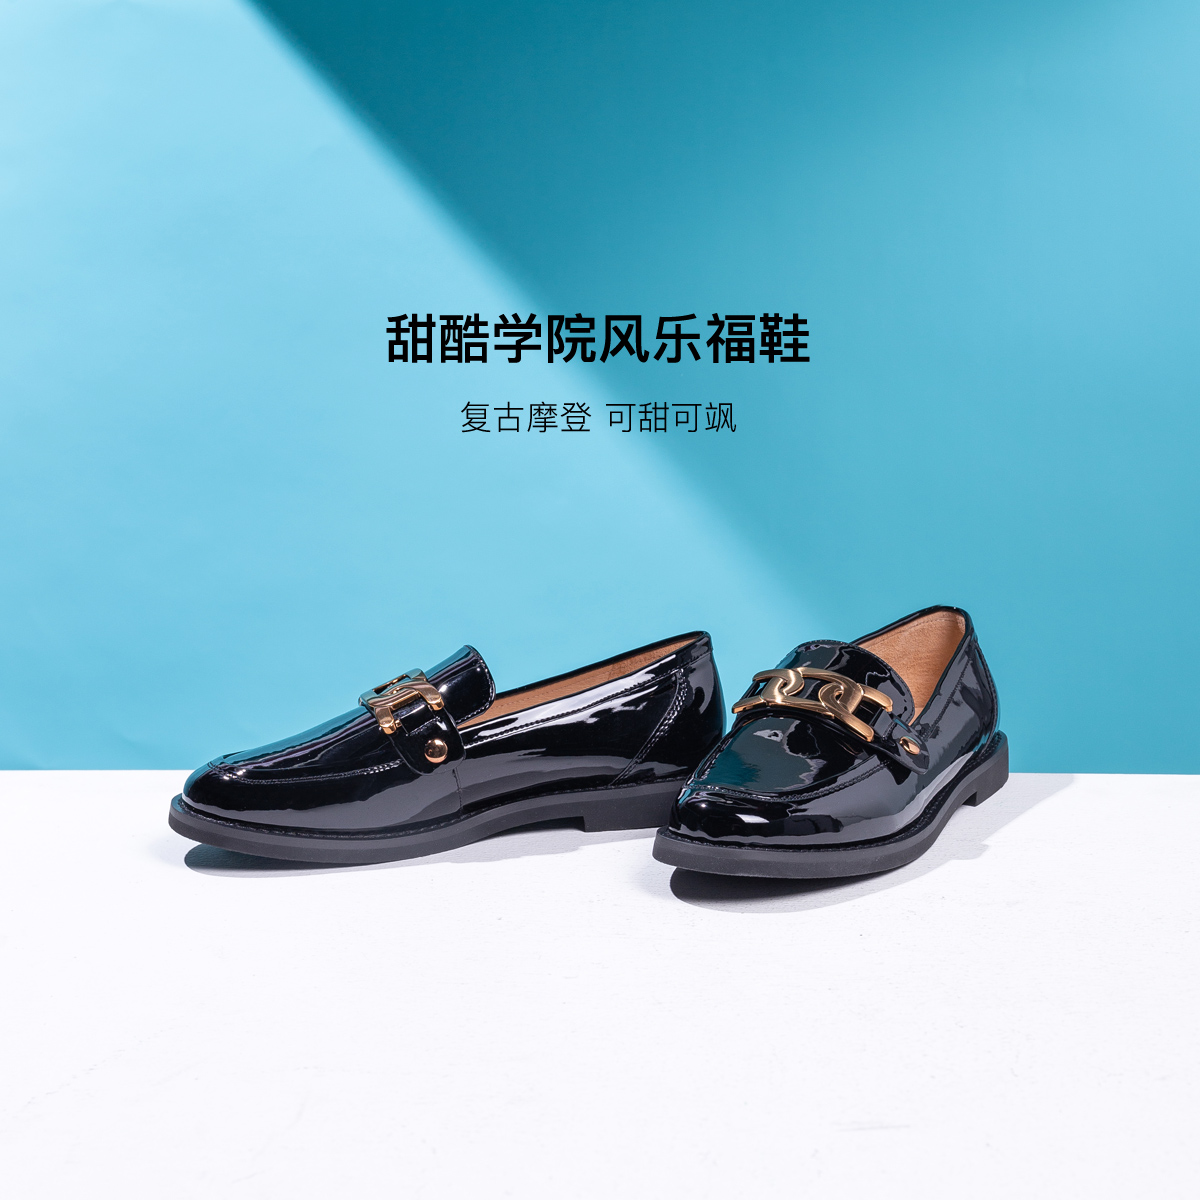 SS11111810 鞋学院女鞋子 JK 春新低跟一脚蹬 2021 星期六乐福鞋女 直